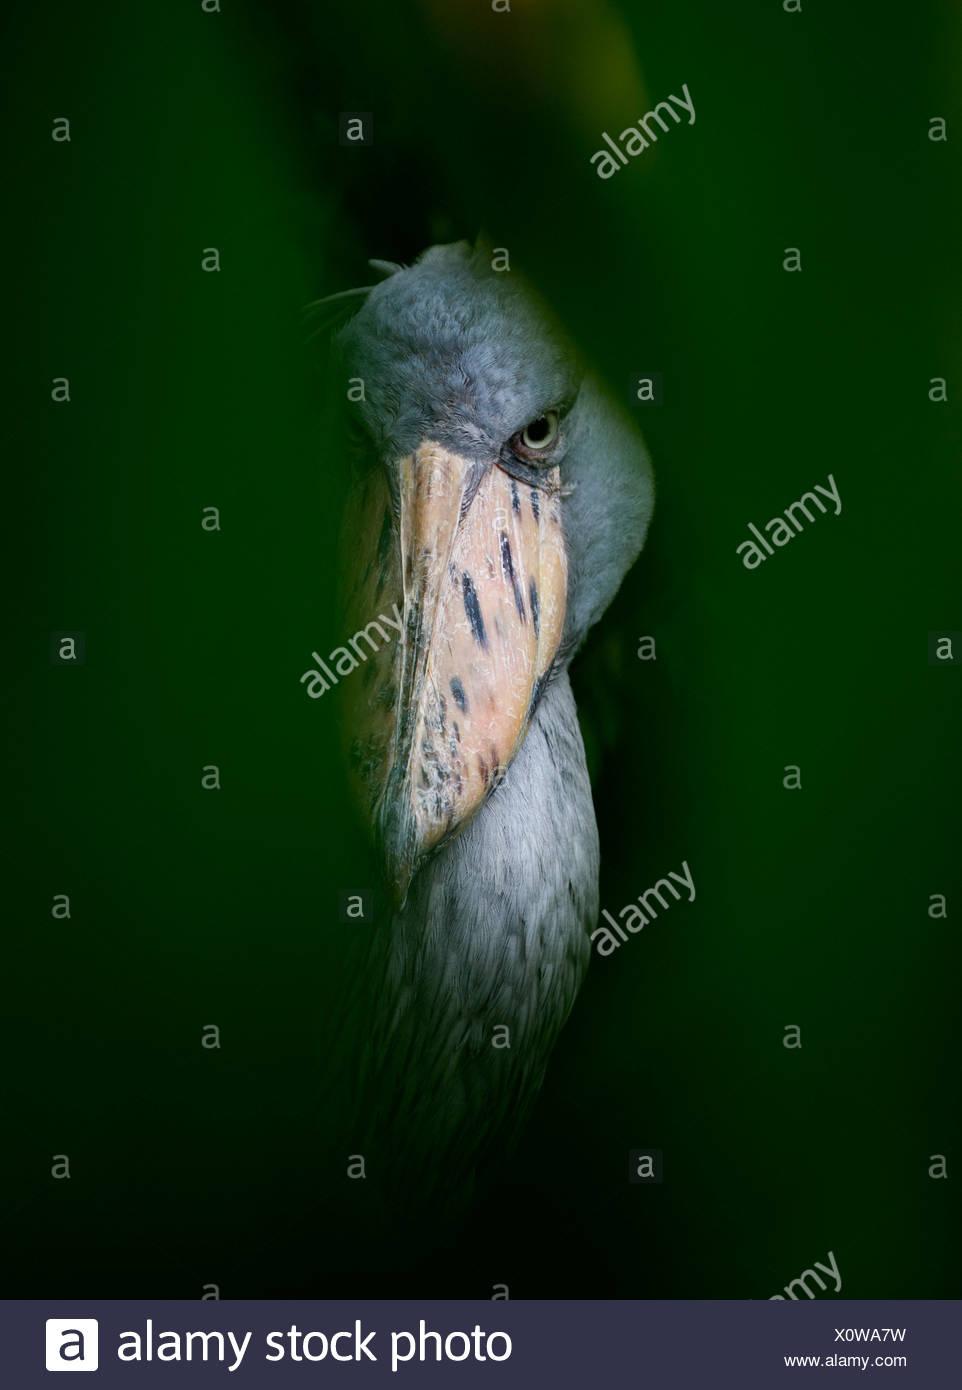 Shoebill Stork(Balaeniceps rex) Captive - Stock Image